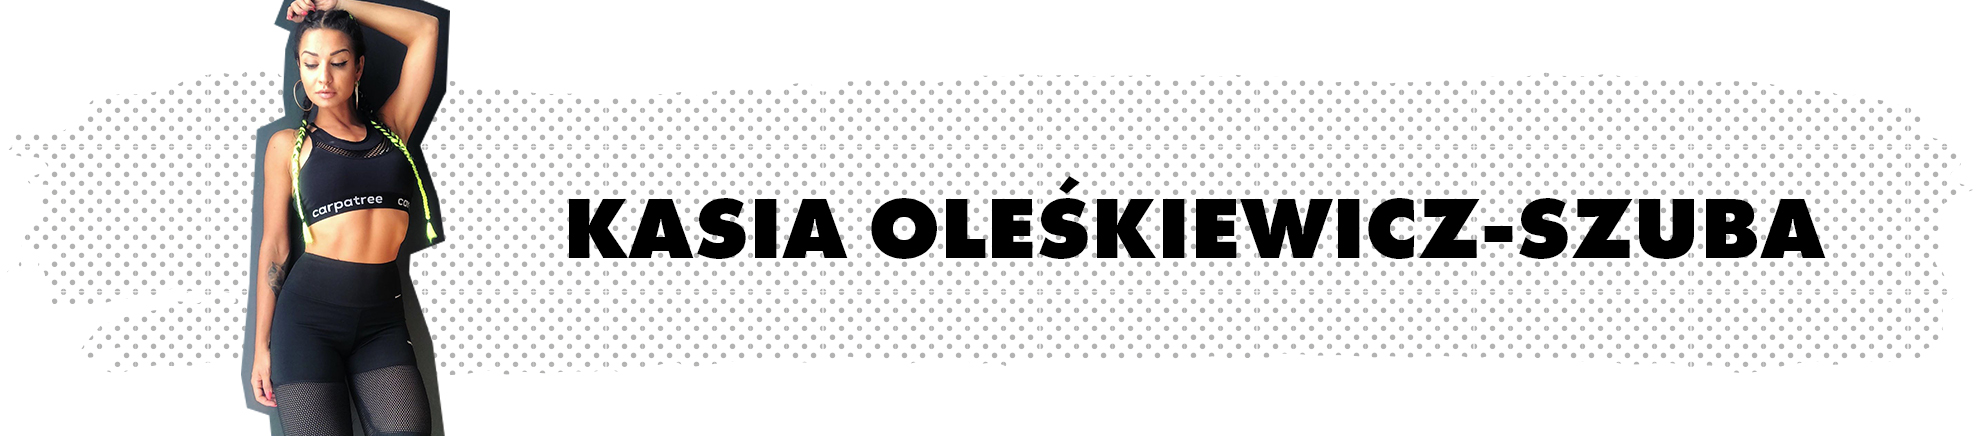 Kasia Oleśkiewicz-Szuba - Carpatree brand ambassador